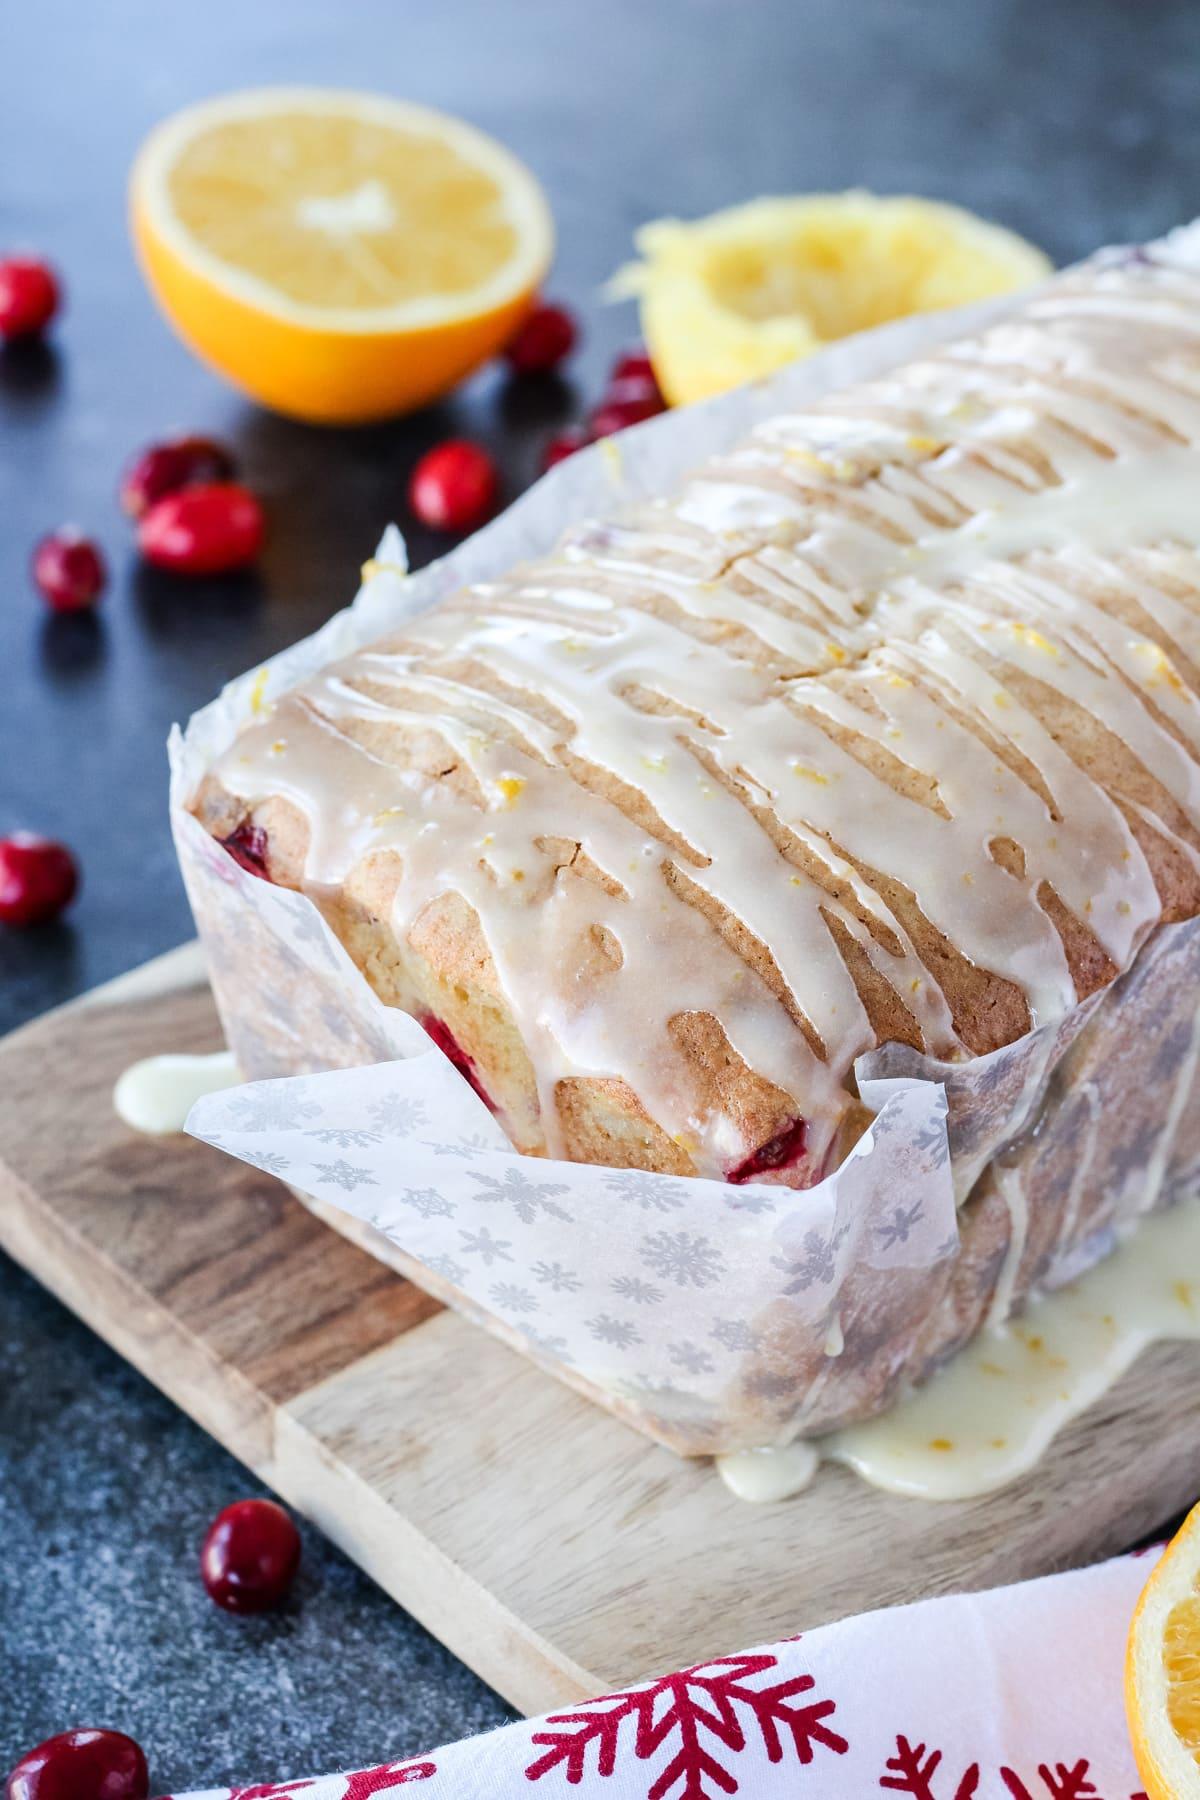 Cranberry Orange Loaf with Orange Glaze drizzle